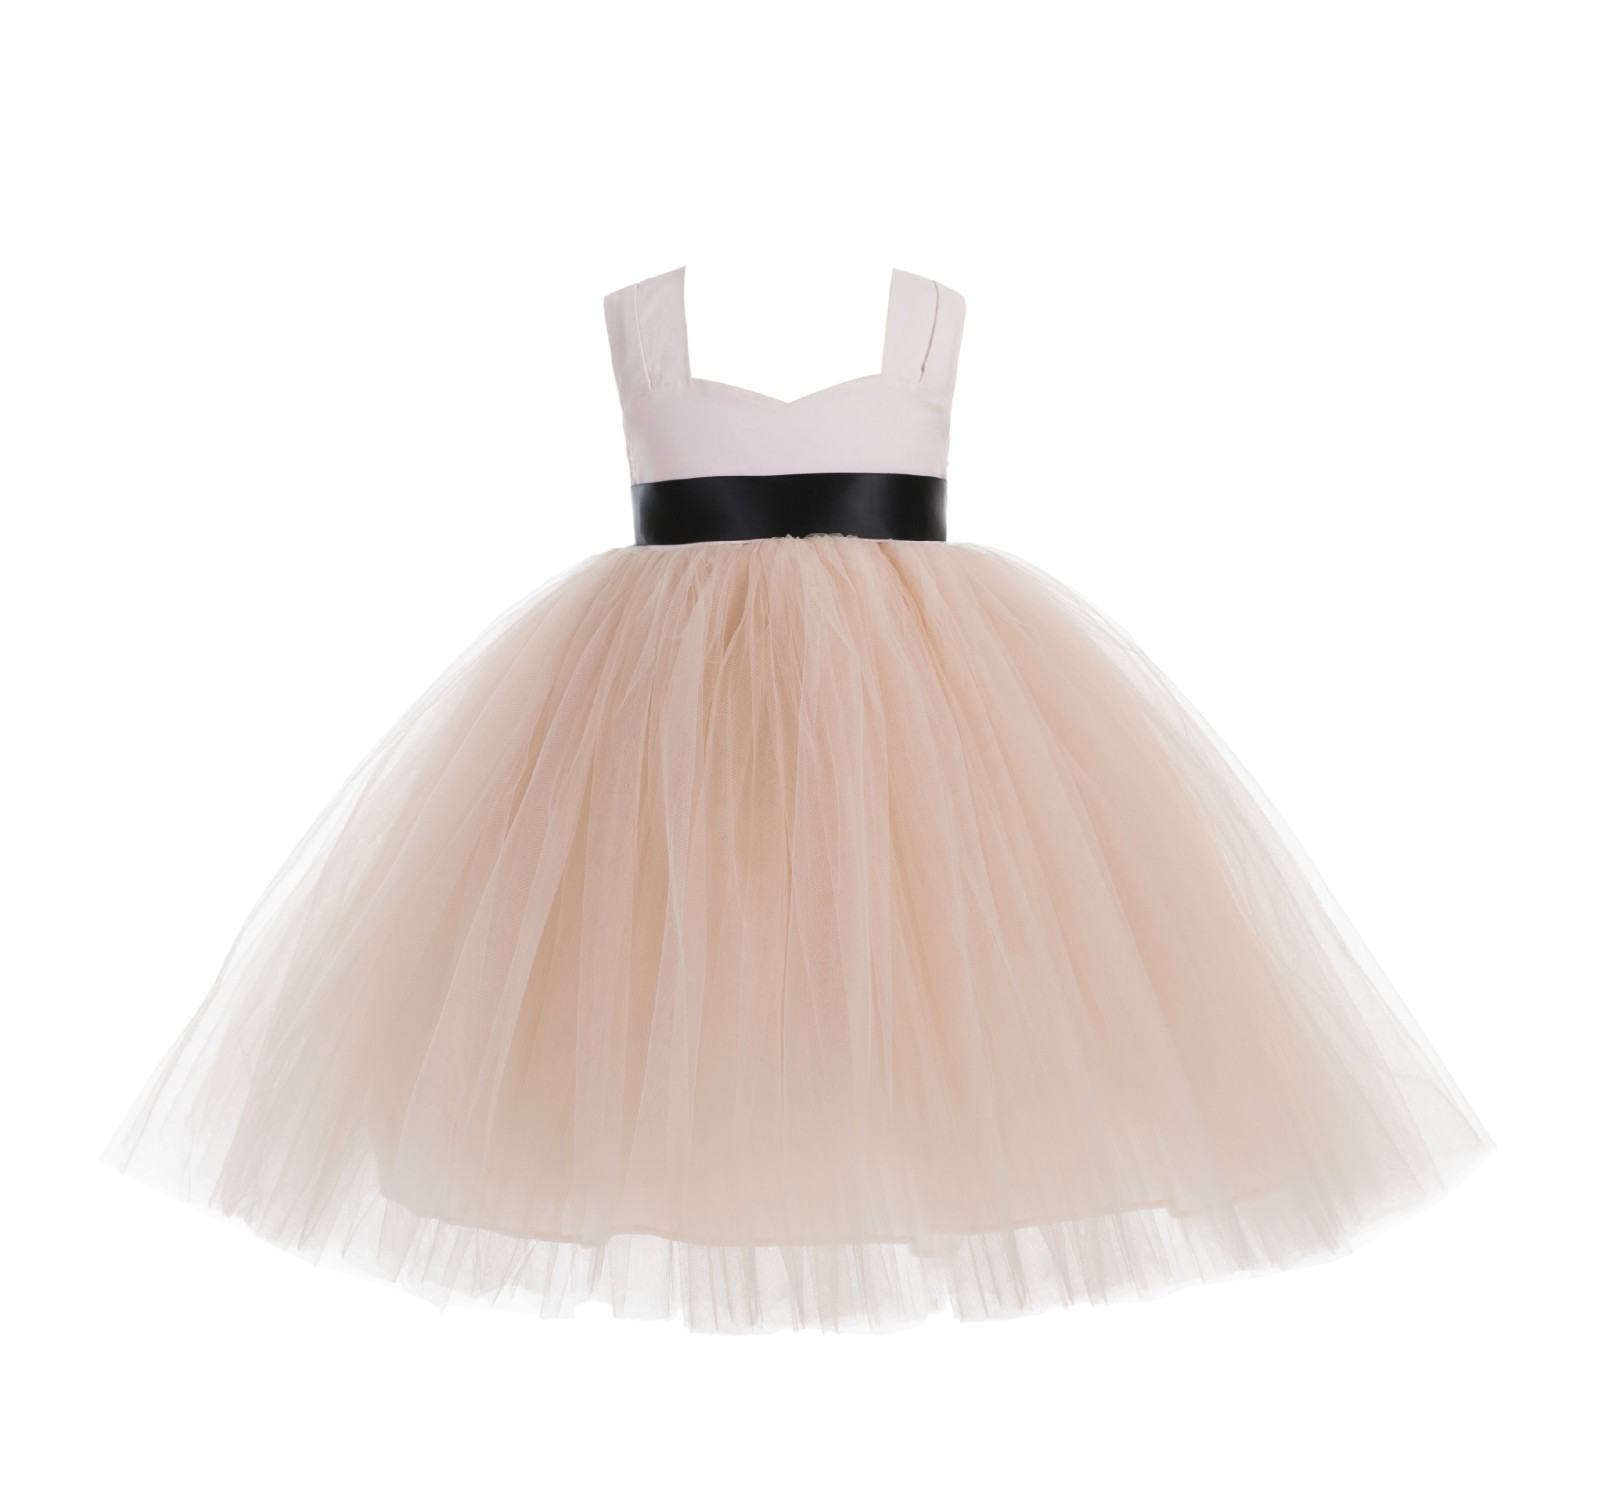 Blush Pink / Black Sweetheart Neck Cotton Top Tutu Flower Girl Dress 171